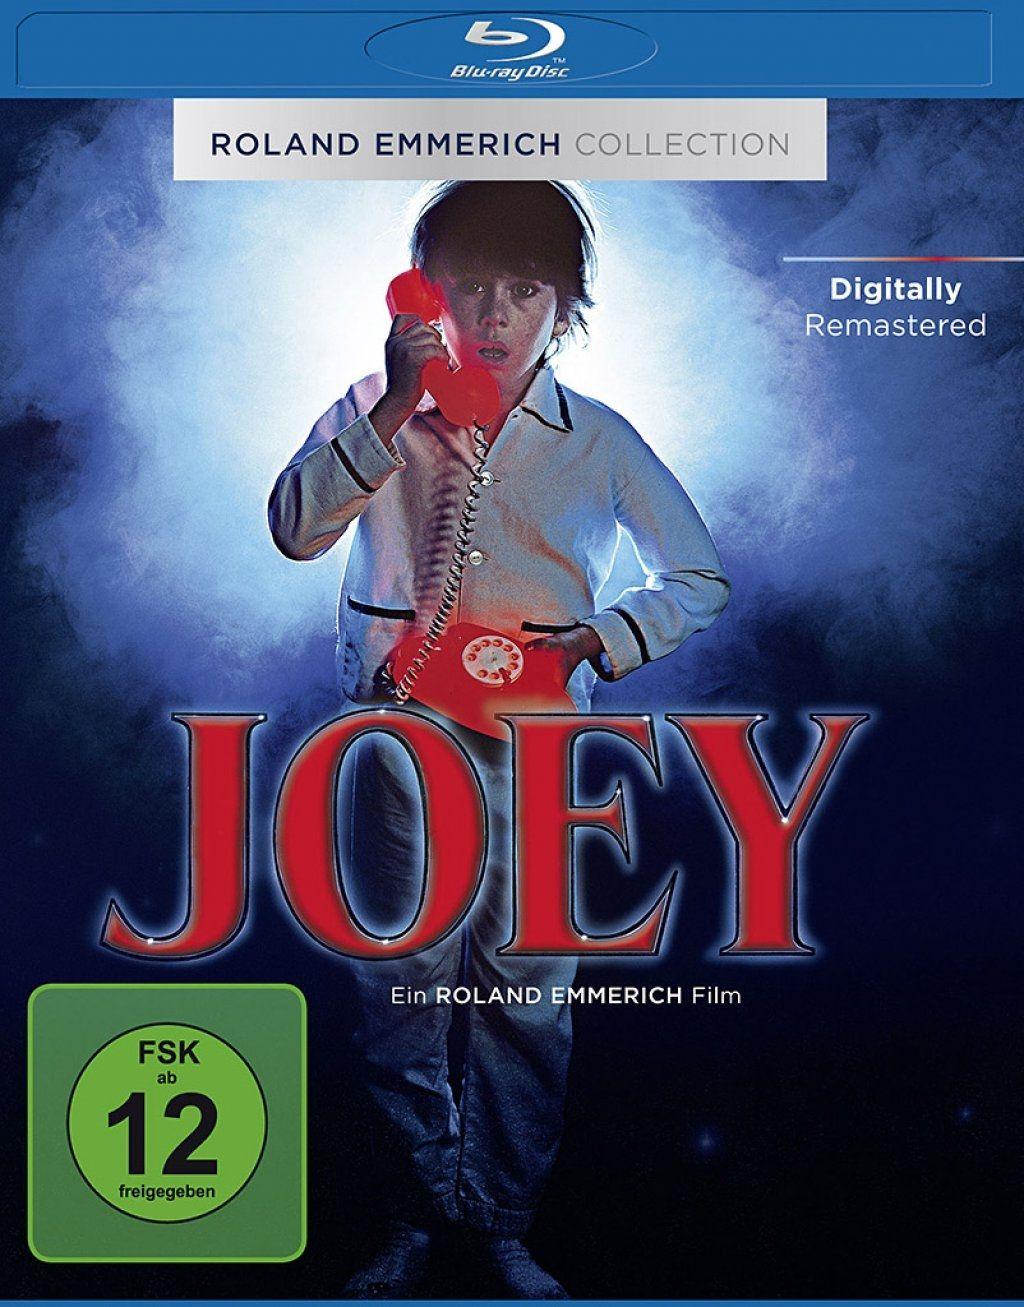 Joey (Roland Emmerich Collection) (BLURAY)